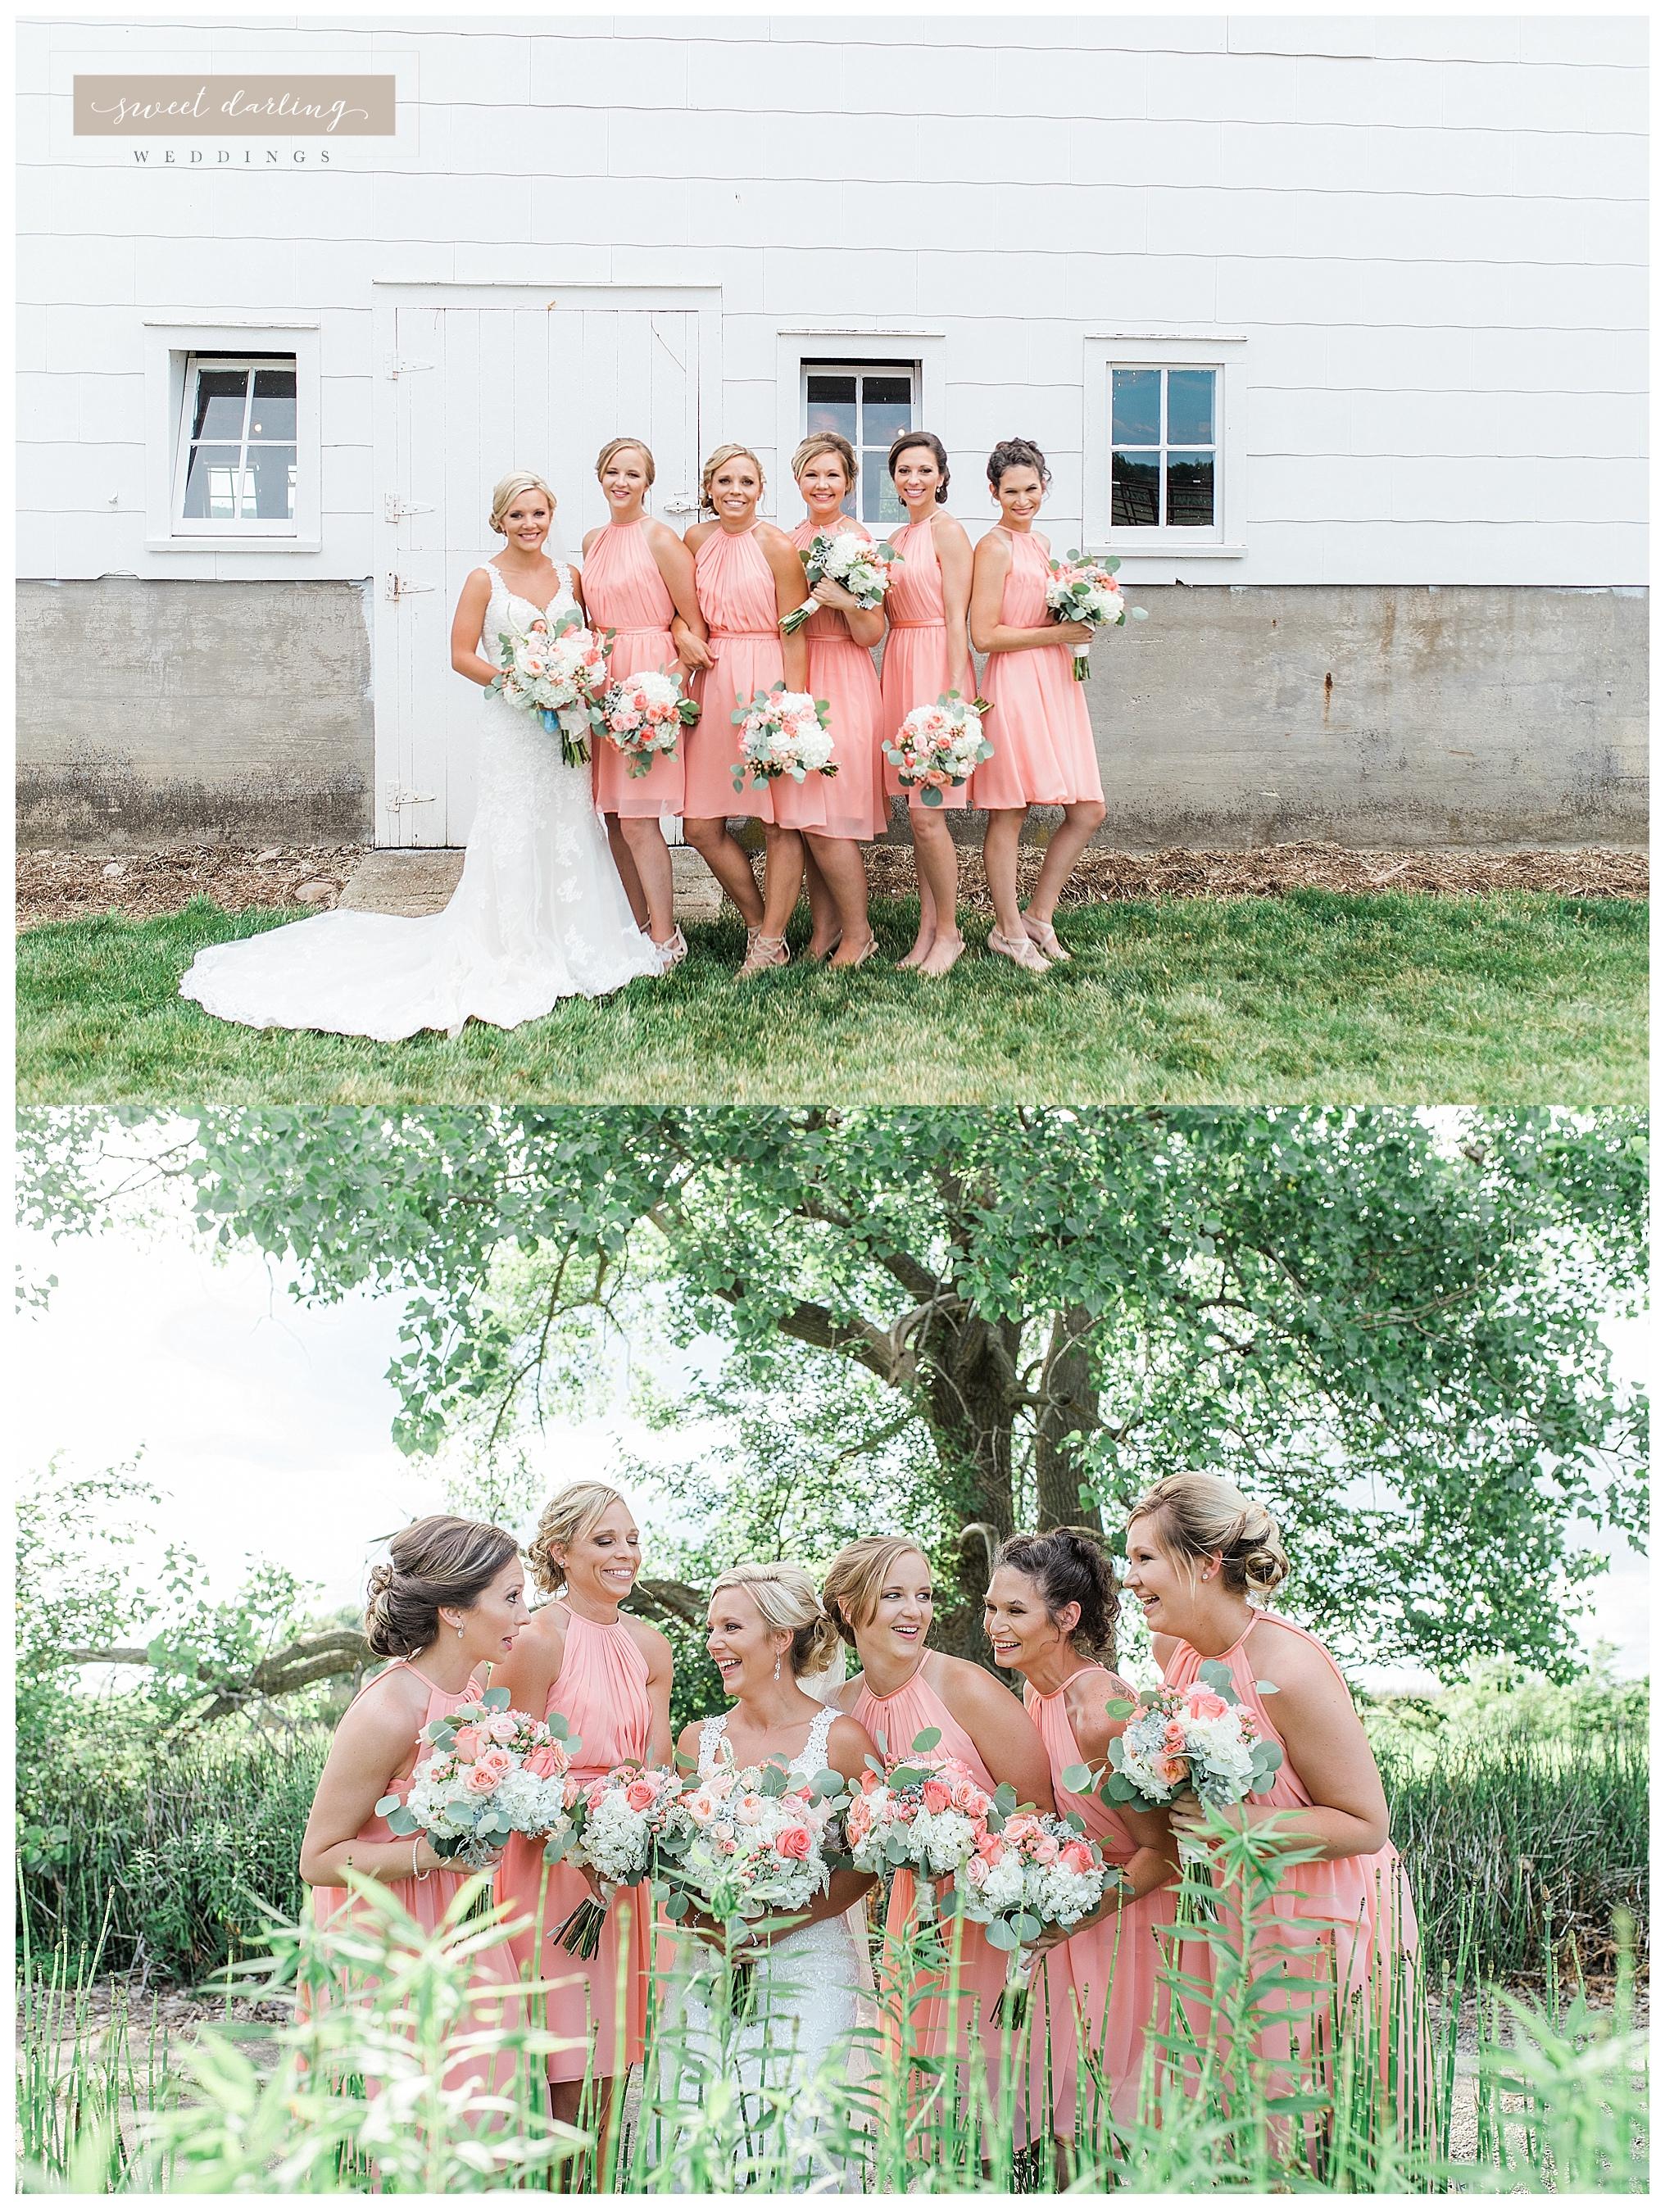 Paxton-illinois-engelbrecht-farmstead-romantic-wedding-photographer-sweet-darling-weddings_1220.jpg